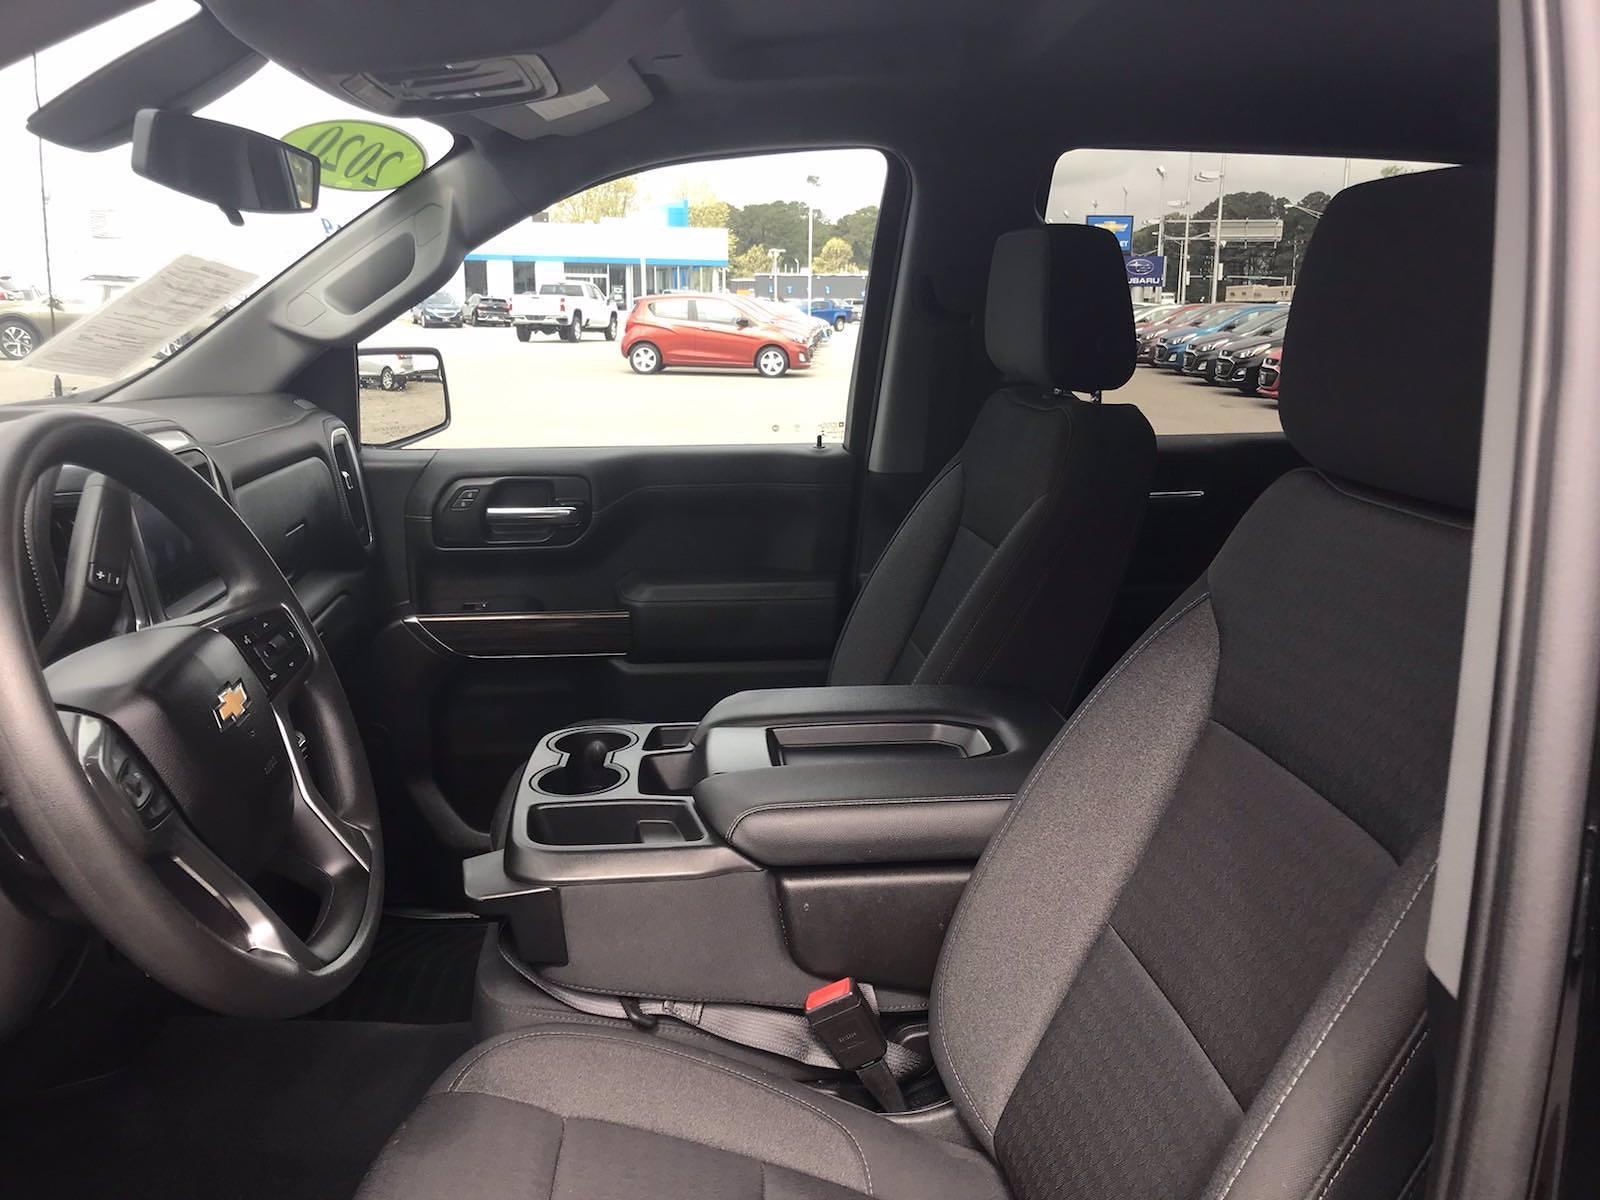 2020 Chevrolet Silverado 1500 Crew Cab 4x4, Pickup #16458PN - photo 25